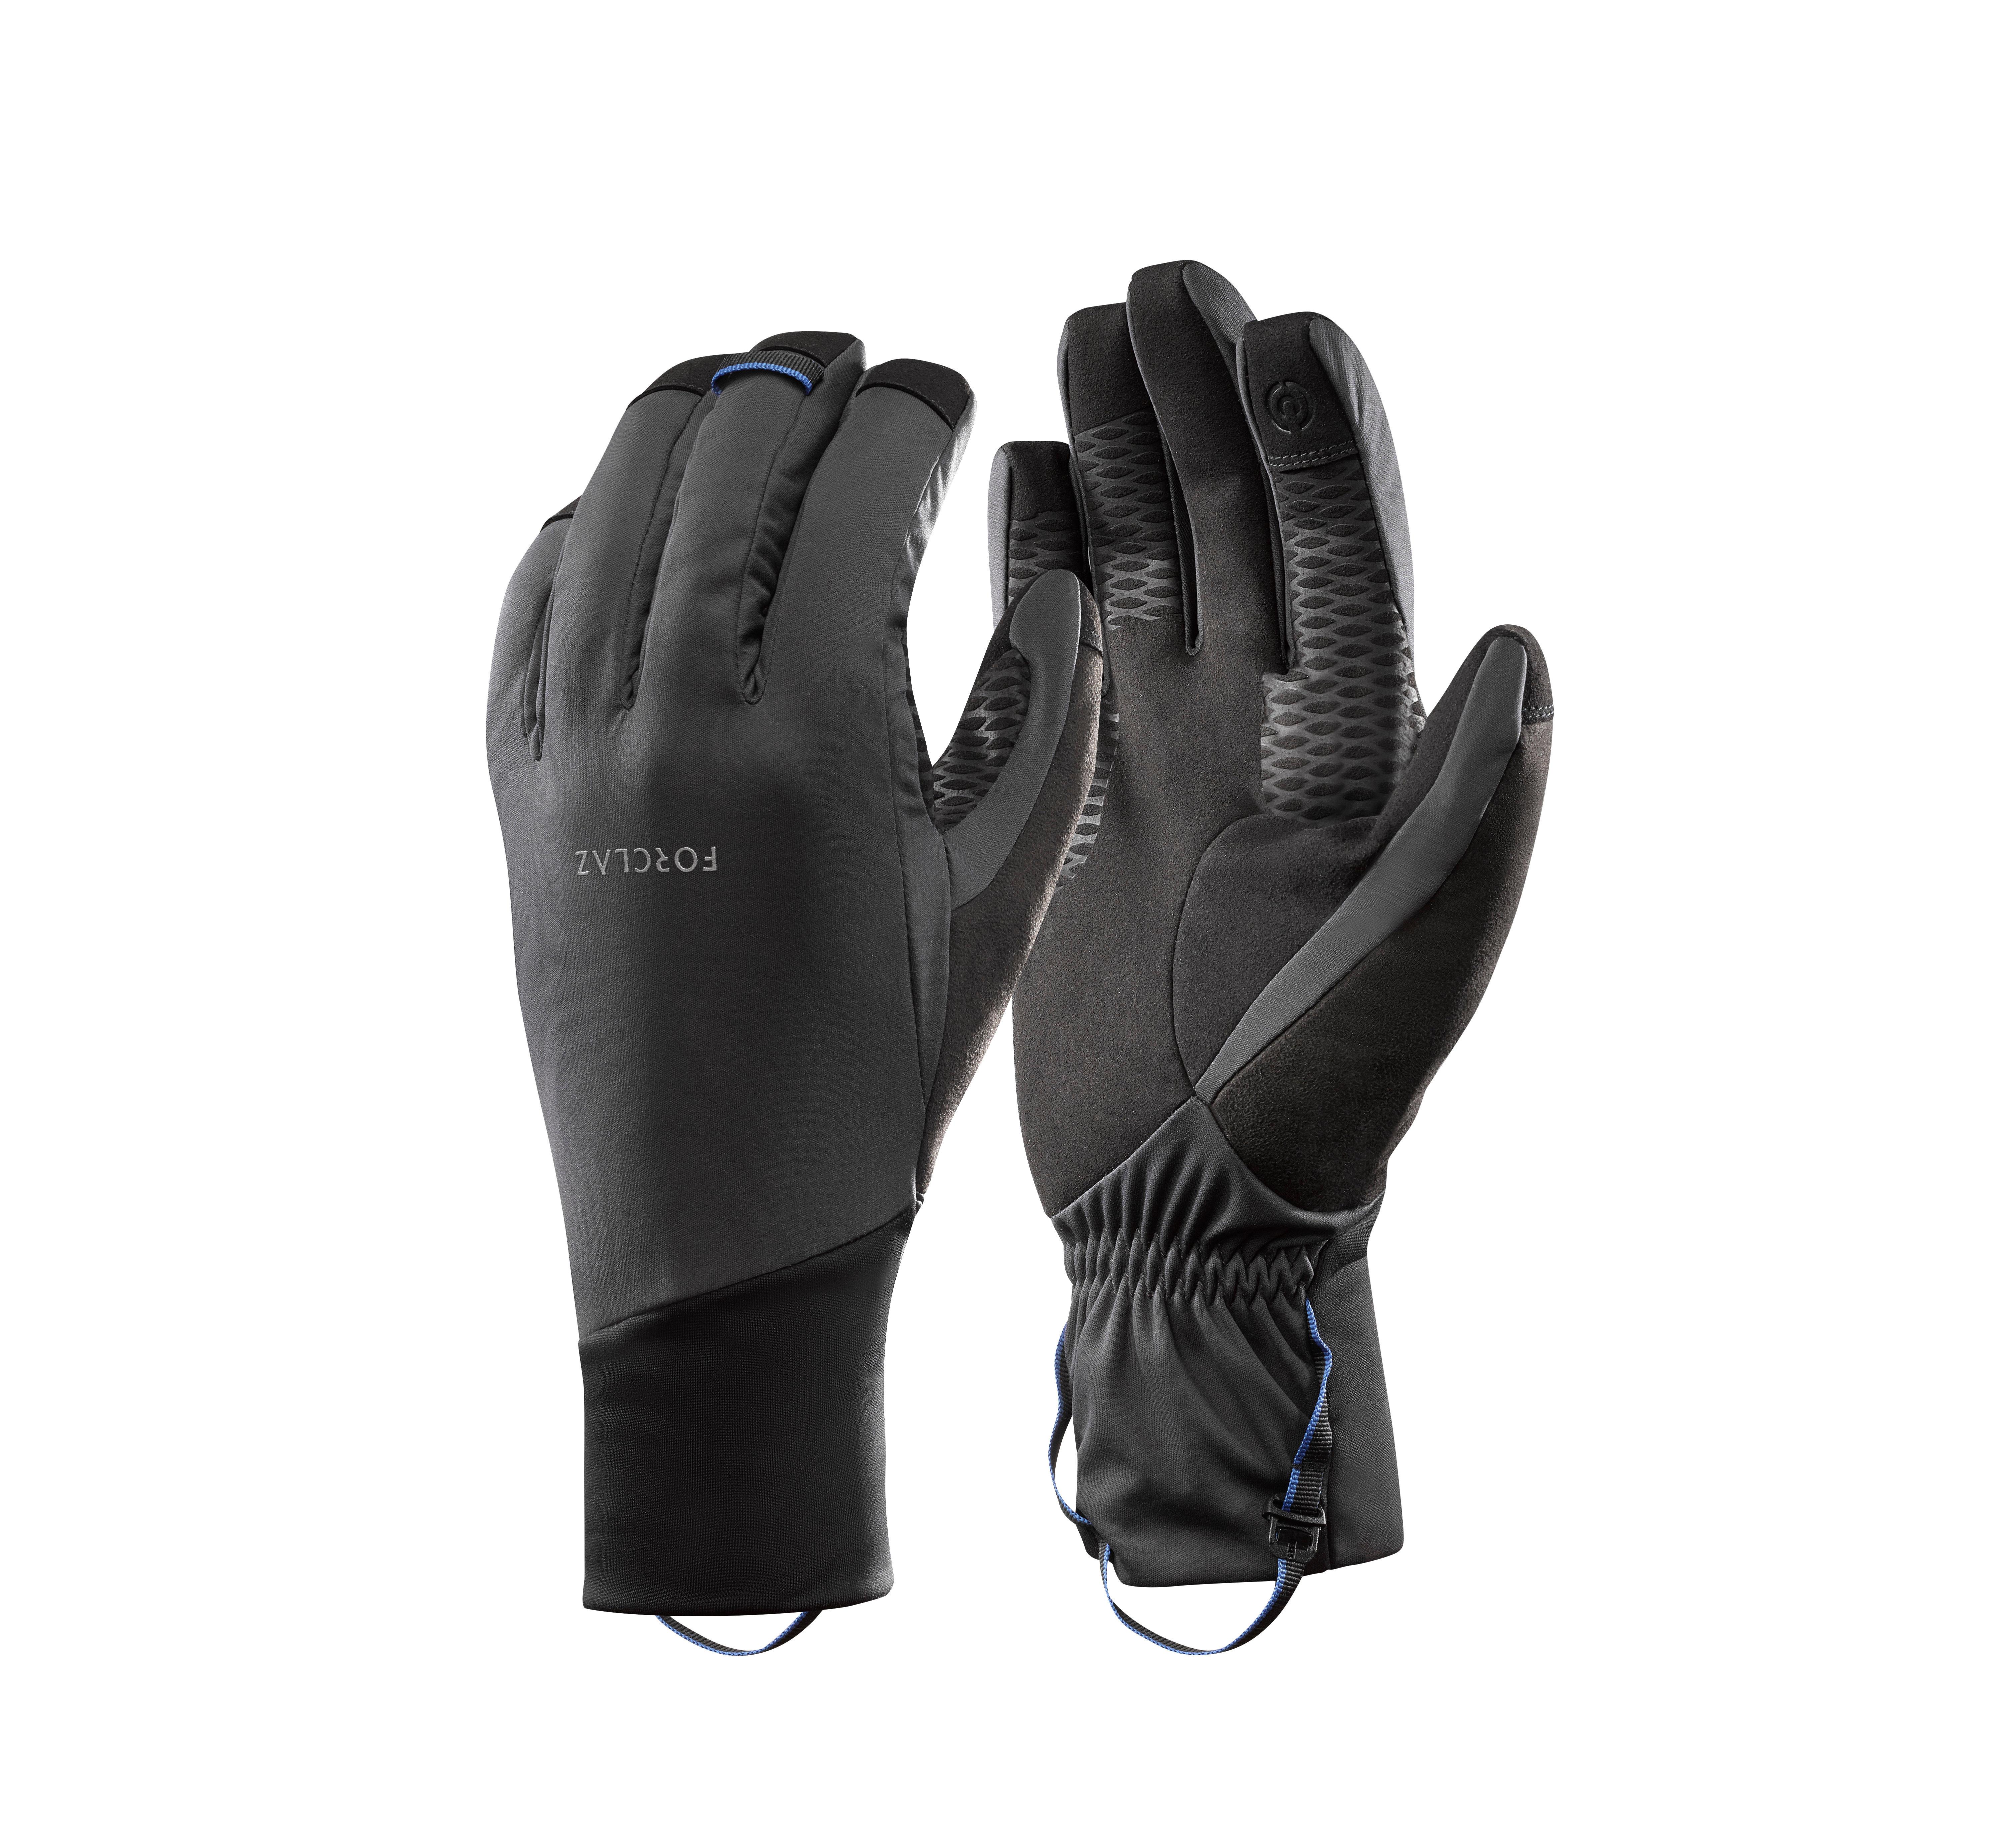 Trek 700 Adult Mountain Trekking Gloves - Grey